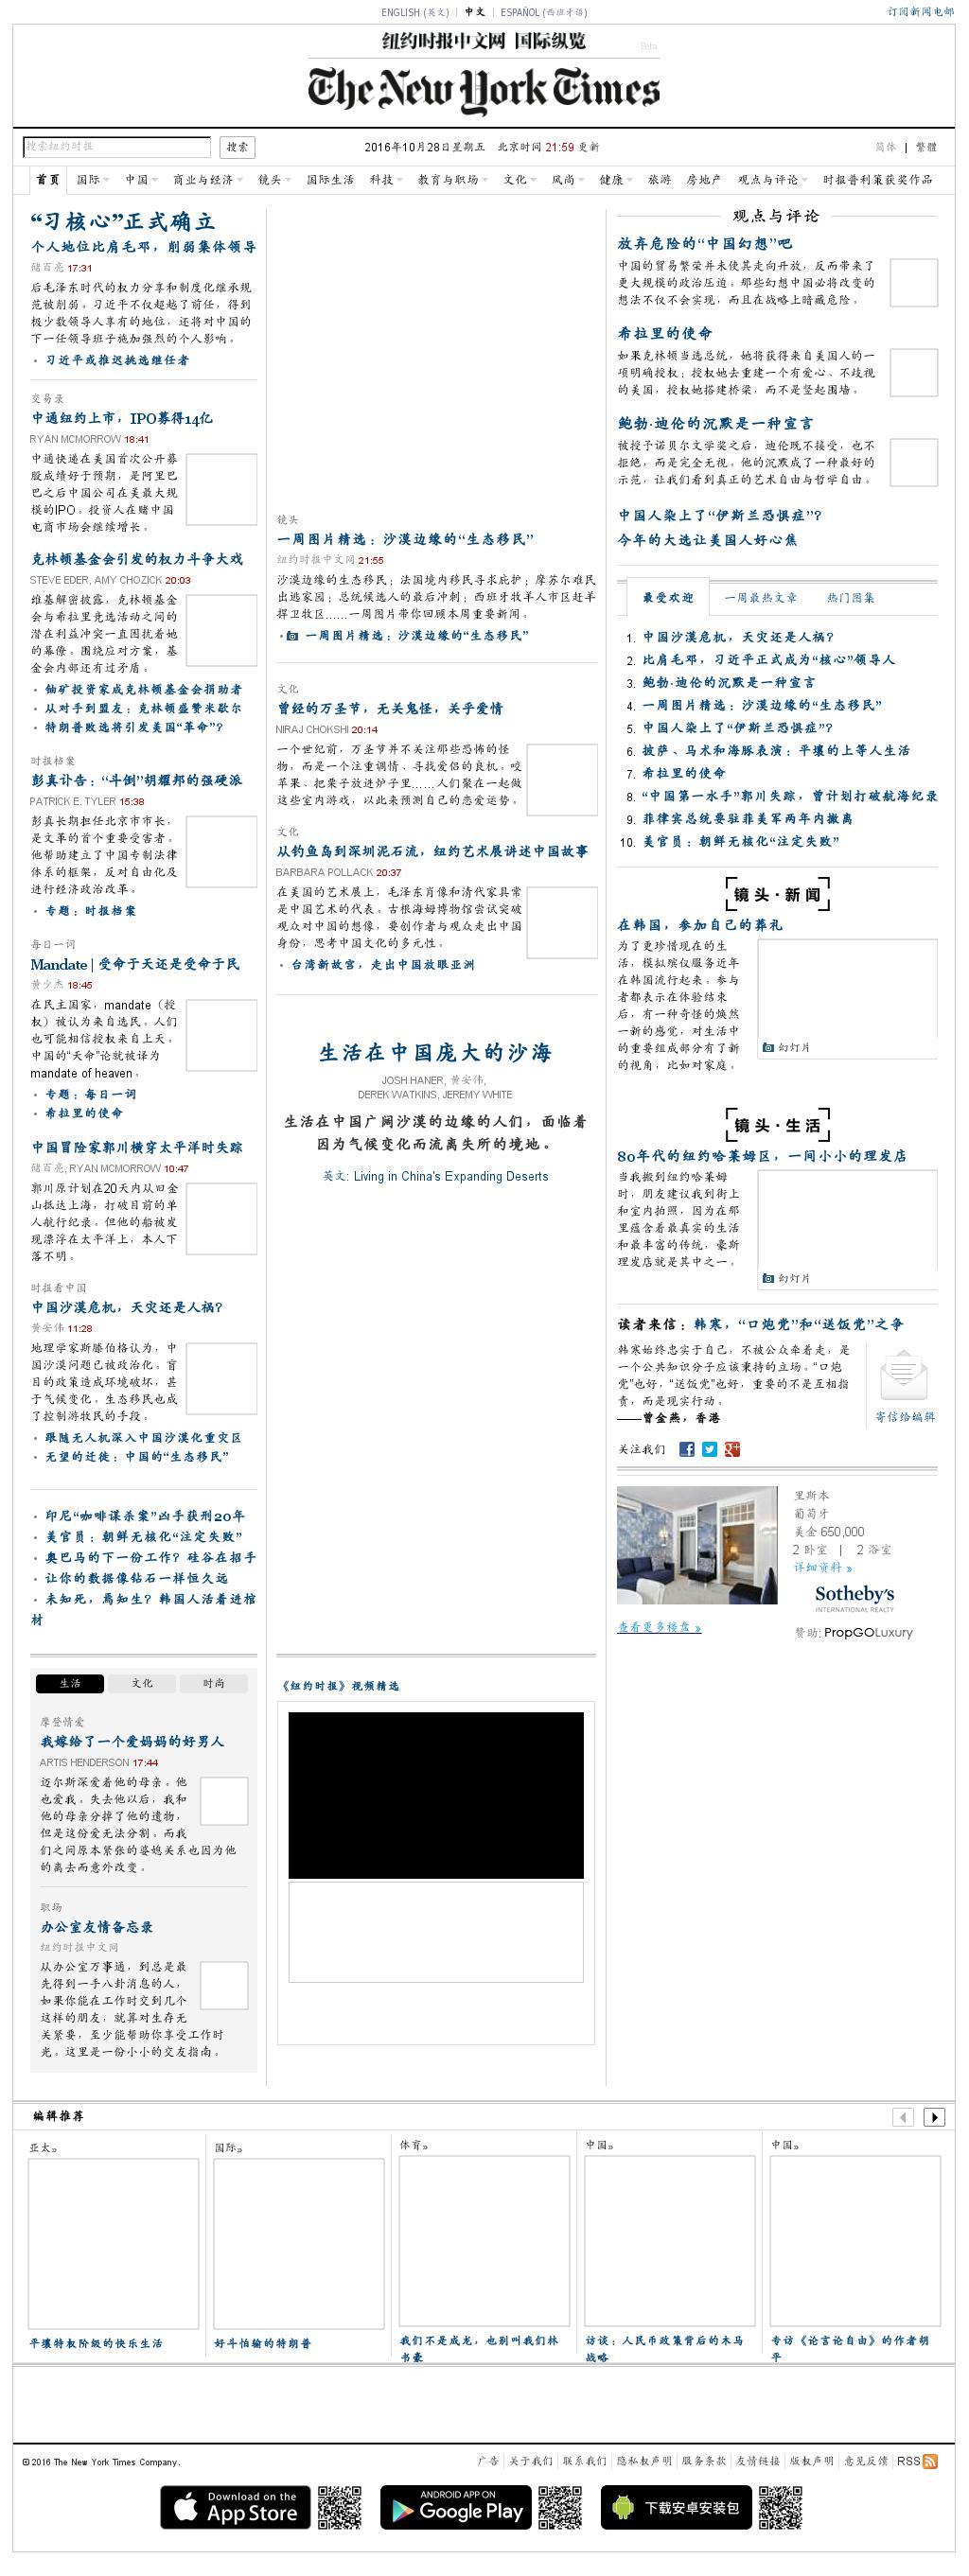 The New York Times (Chinese) at Friday Oct. 28, 2016, 6:12 p.m. UTC